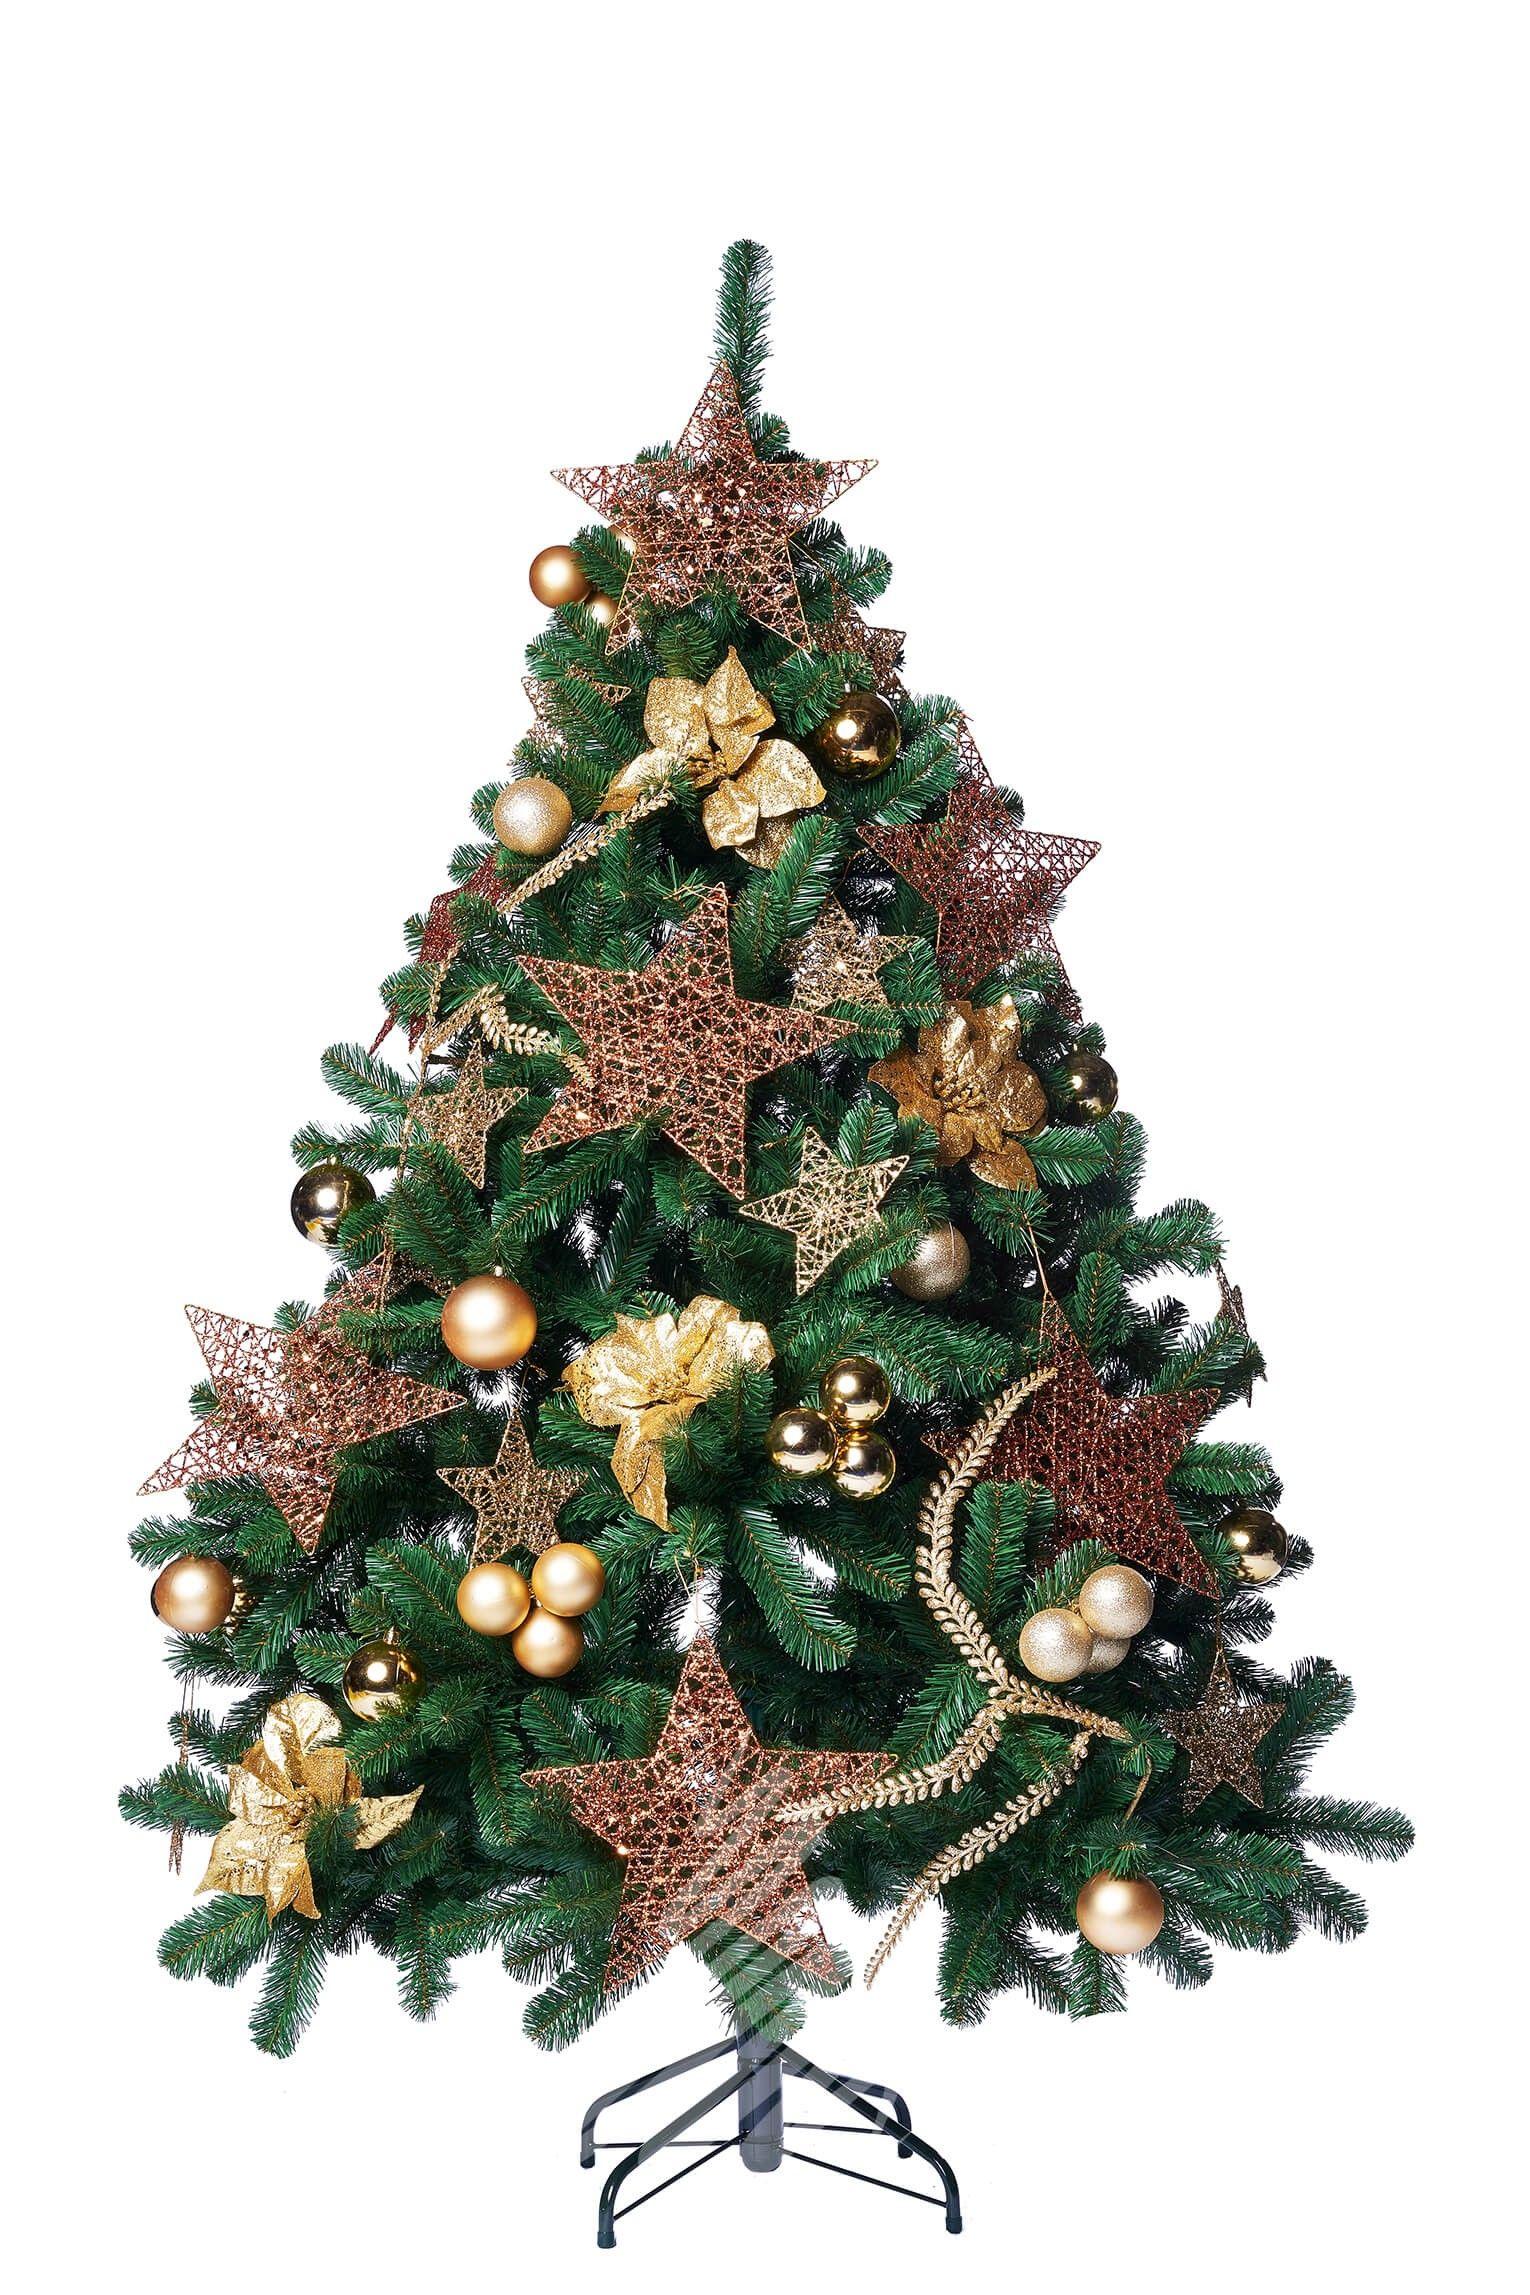 6ft Artificial Christmas Tree Jewel Pine Artificial Christmas Tree 6ft Artificial Christmas Tree Christmas Tree Sale